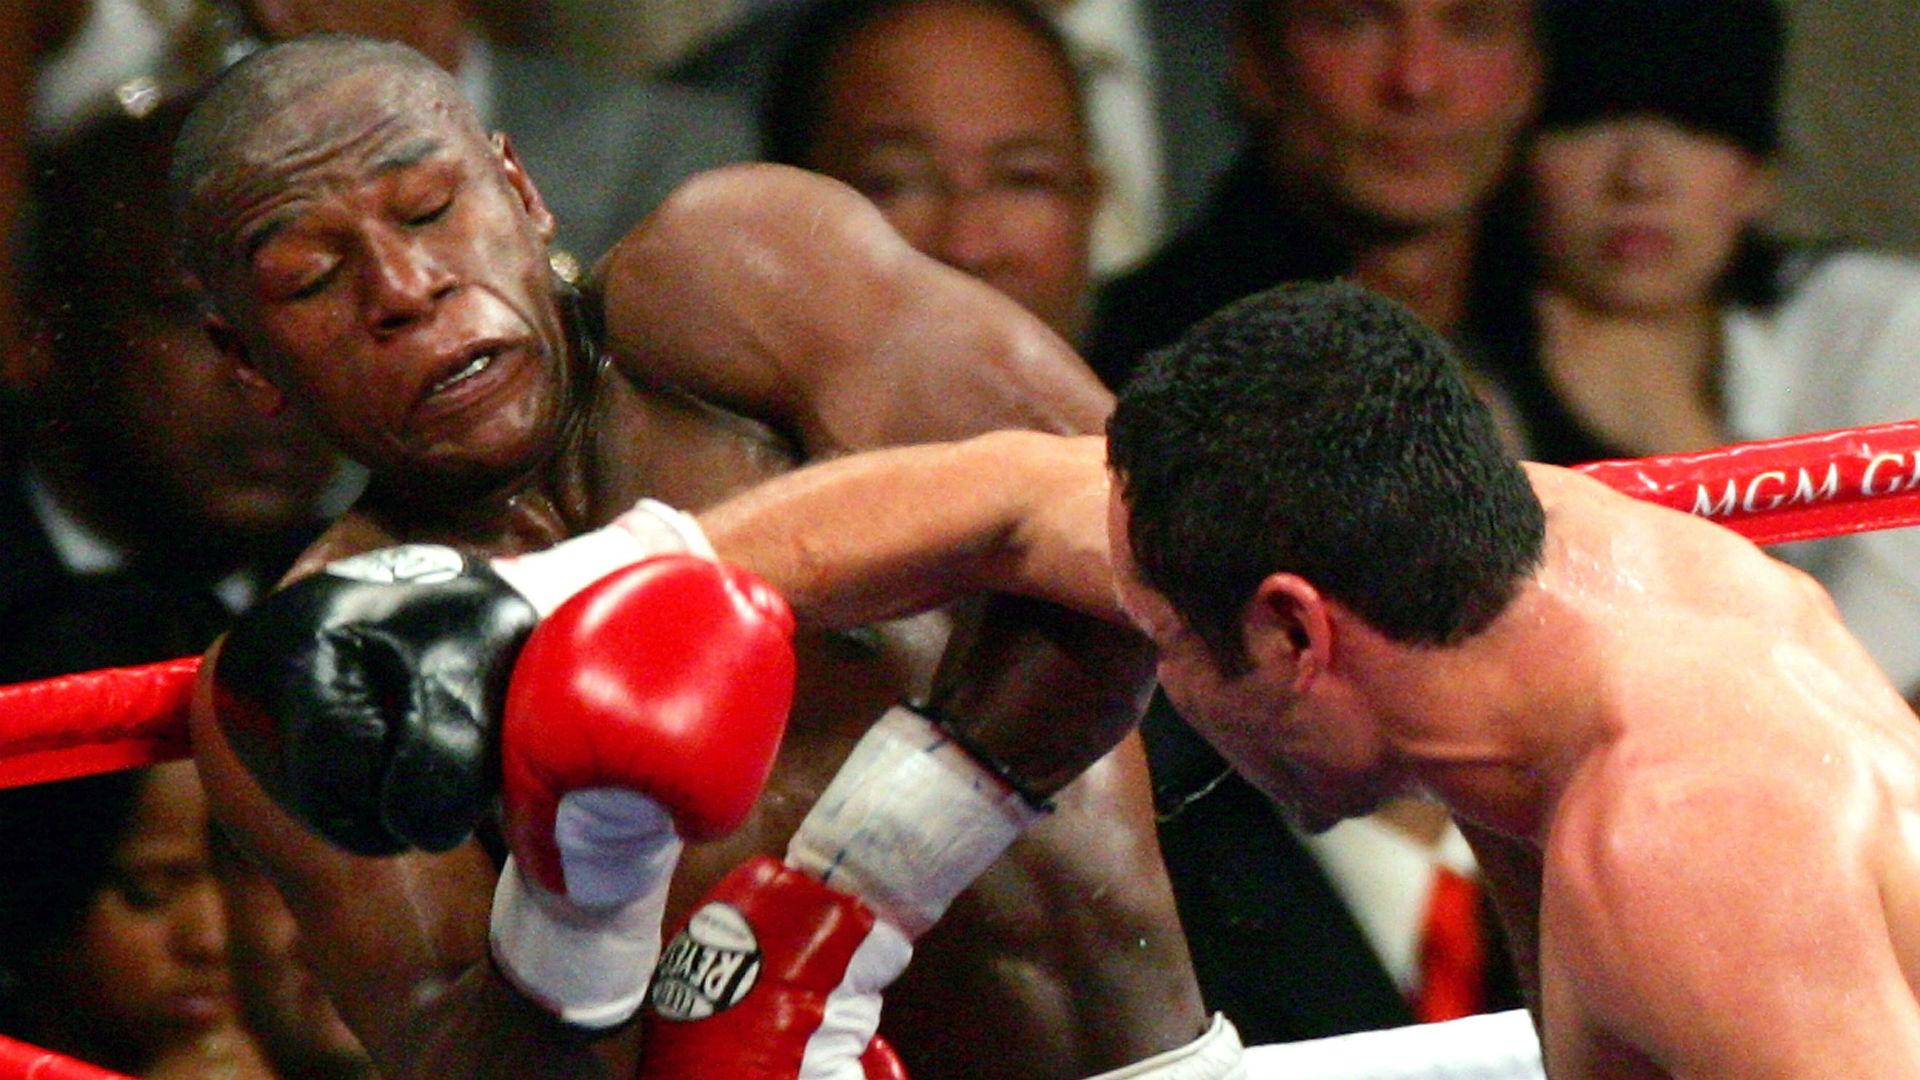 Oscar De La Hoya Calls Floyd Mayweather Boring Af In Scathing Open Letter additionally Oscar De La Hoya Asks Boxing Fans Boycott Mayweather Mcgregor Fight additionally 1062354 Oscar De La Hoya Be es Latest To Criticise Floyd Mayweather Vs Conor Mcgregor likewise Oscar De La Hoya Warns Mayweather Vs Mcgregor Could Hurt Boxing also Conor McGregor Floyd Mayweather Ring Girls Countdown. on oscar de la hoya mayweather letter